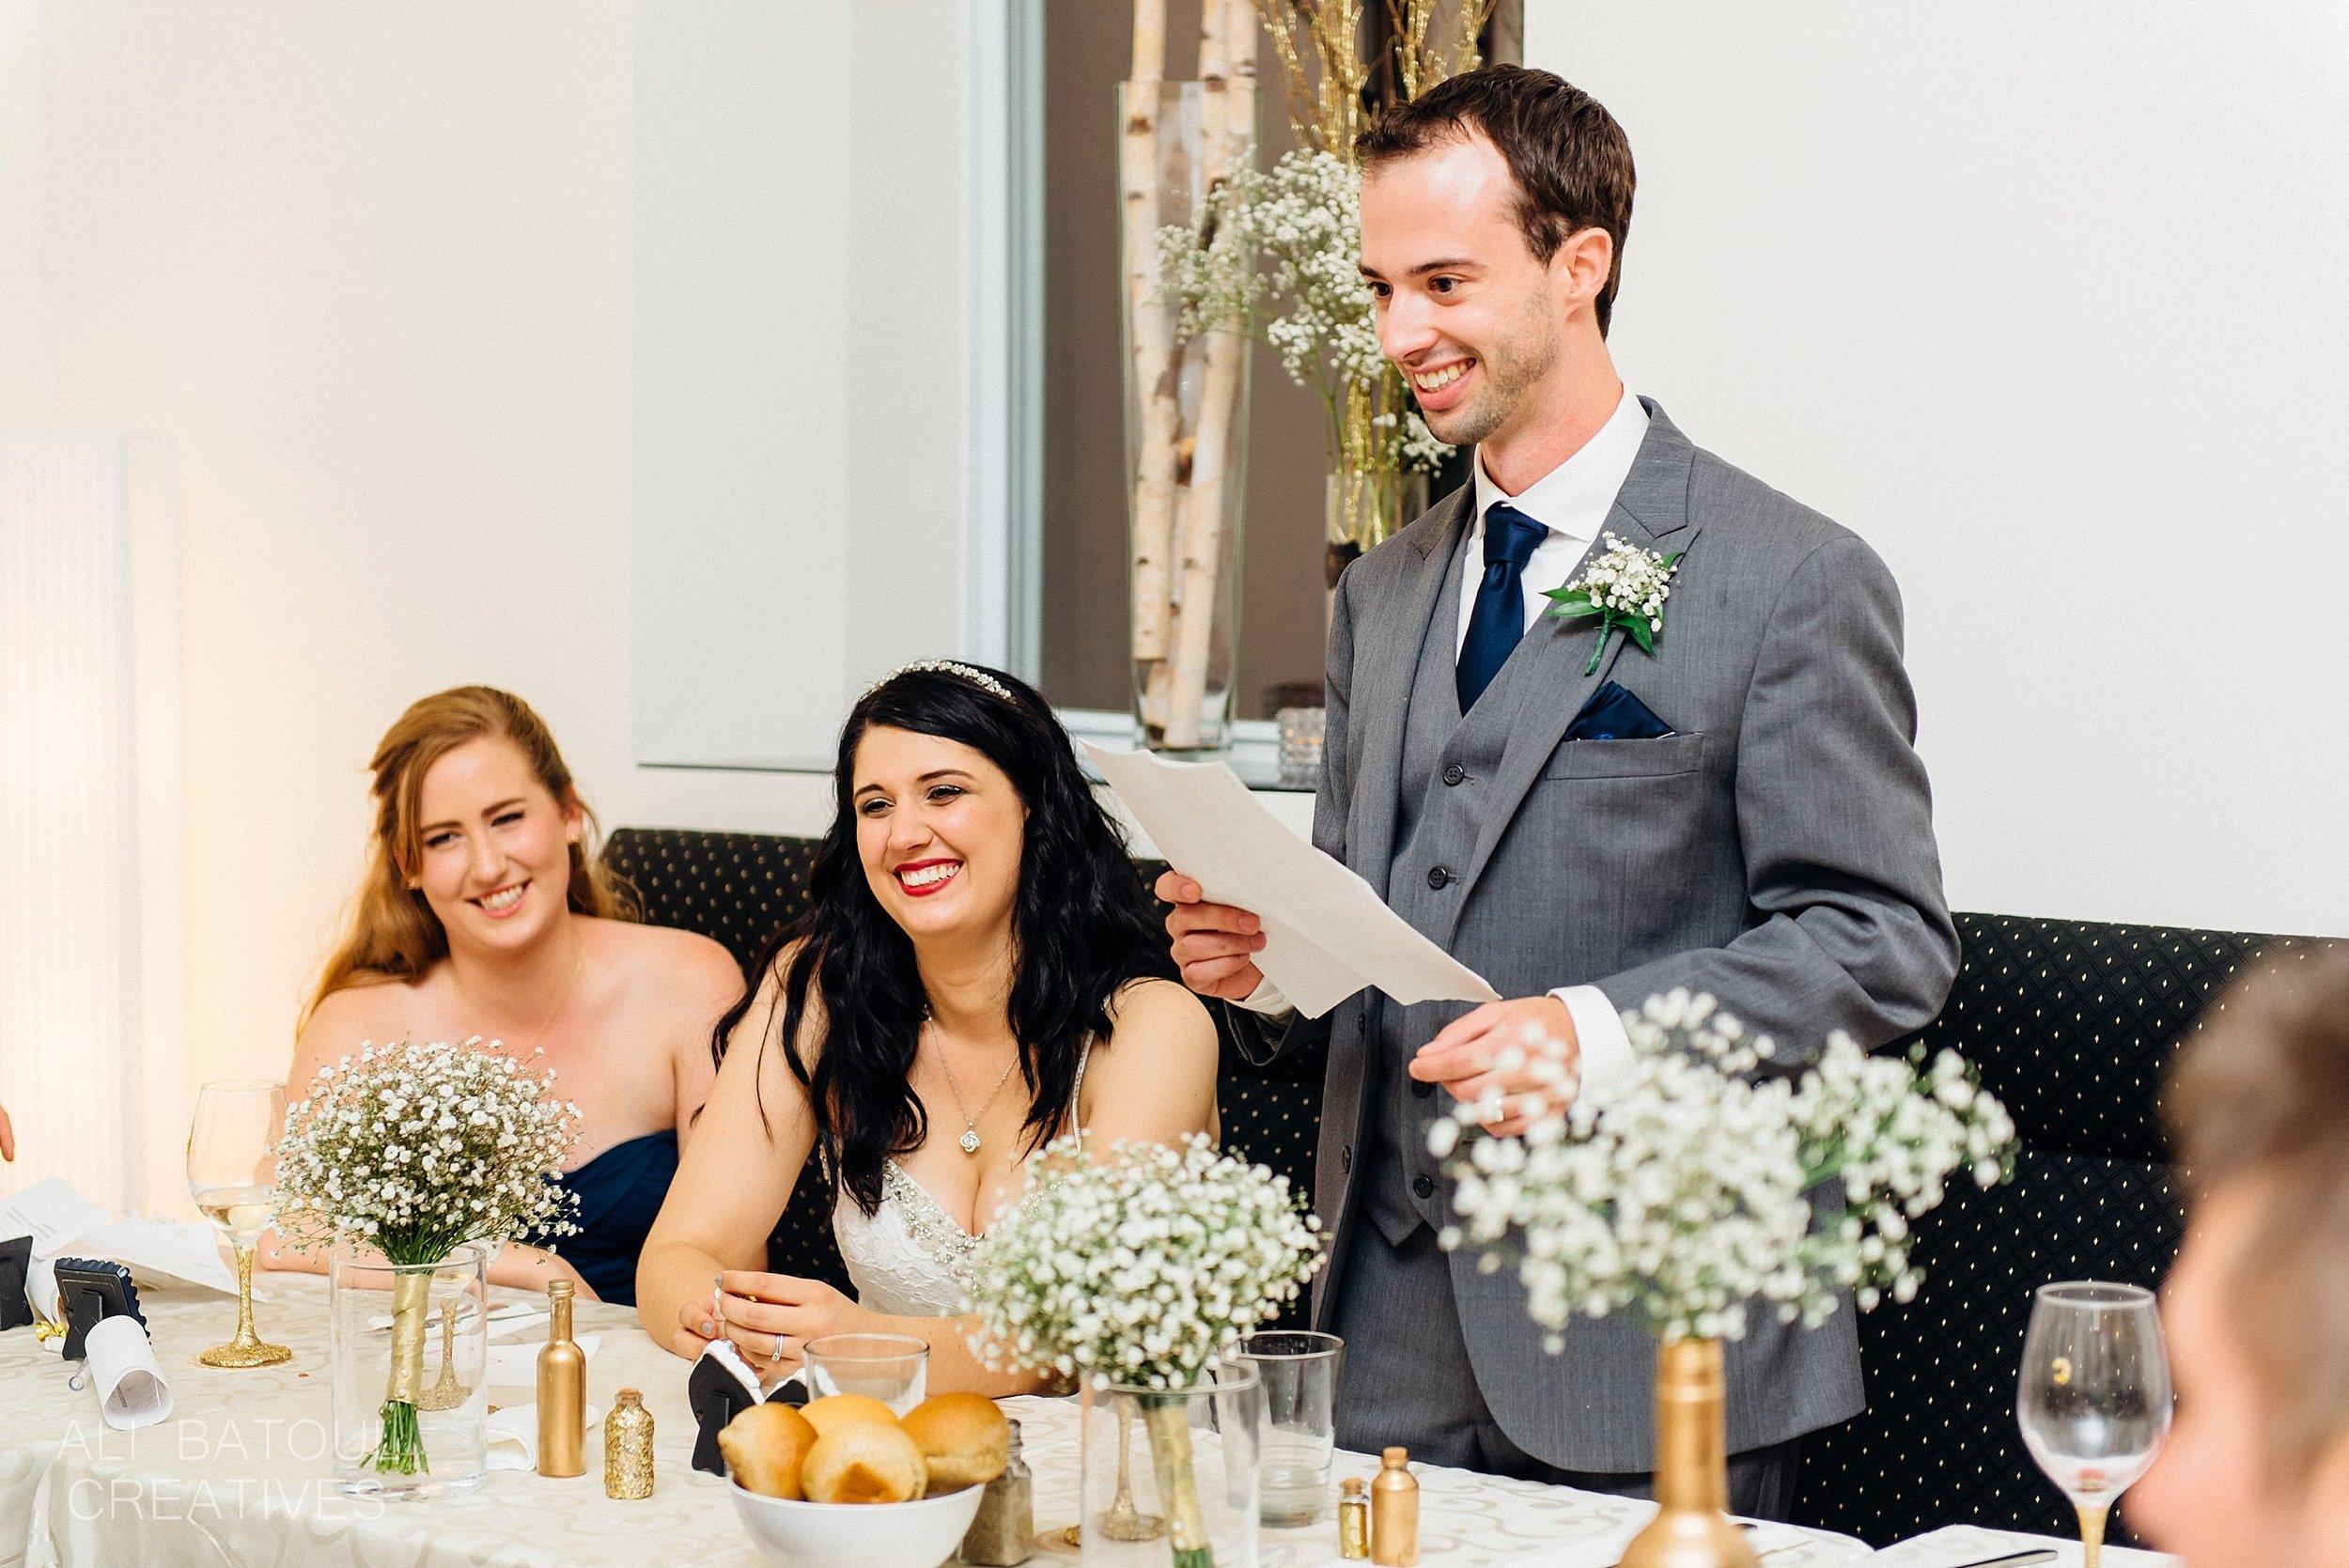 Jocelyn + Steve At The Schoolhouse Wedding - Ali and Batoul Fine Art Wedding Photography_0104.jpg